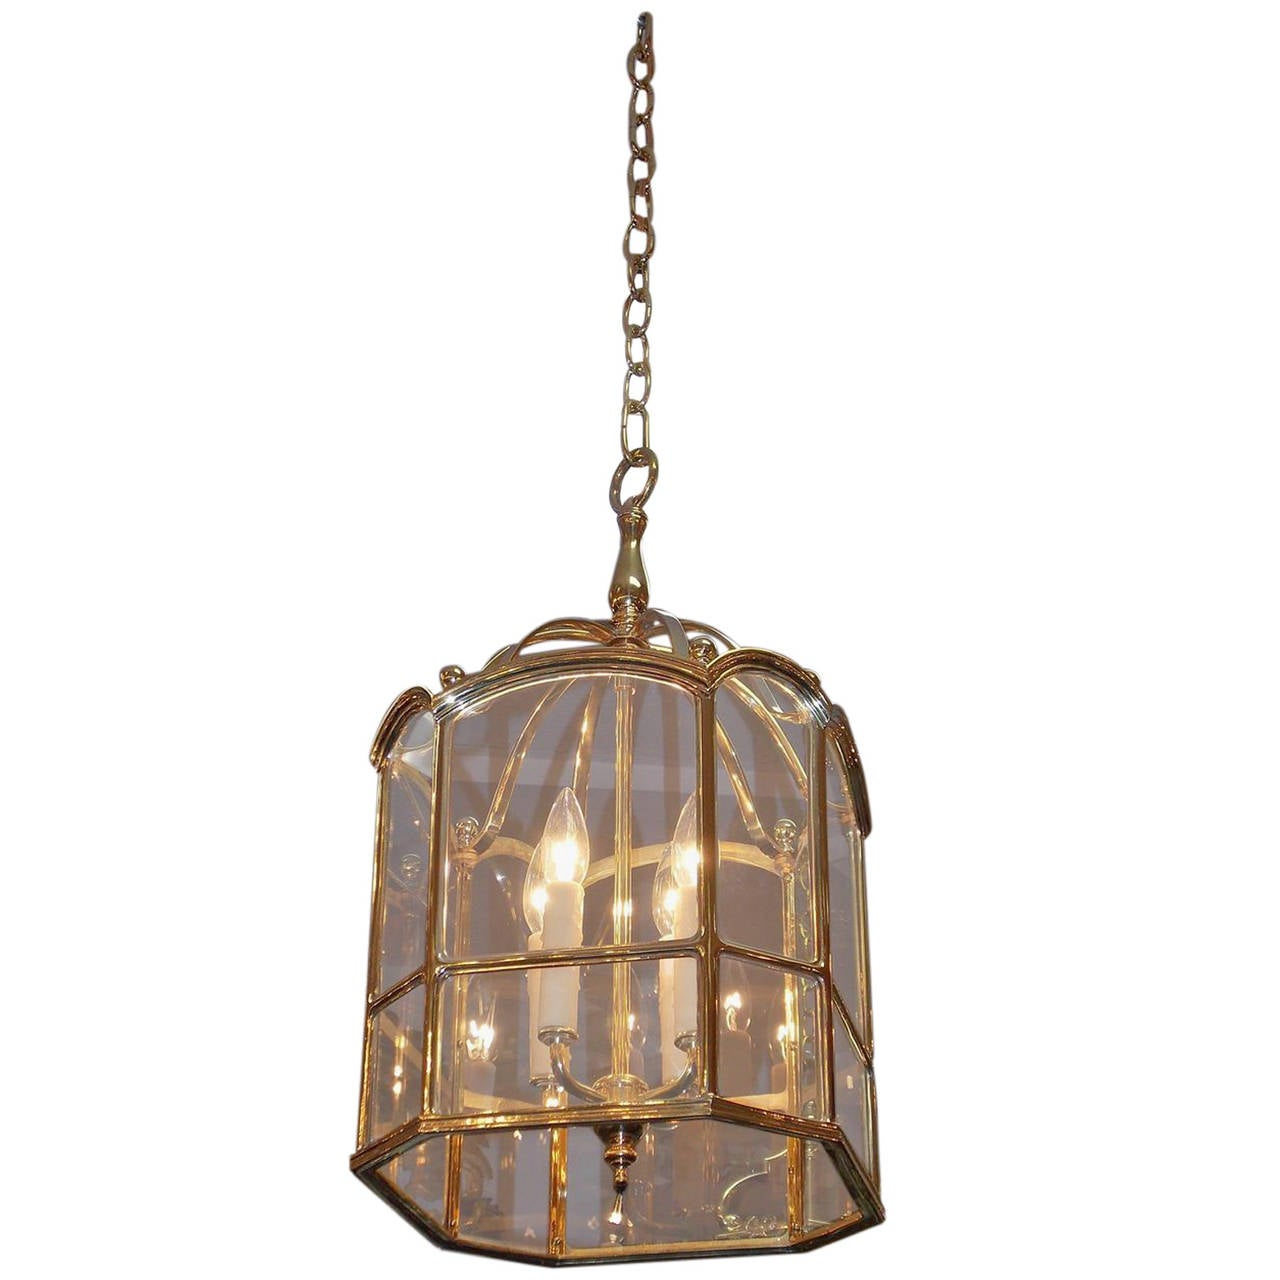 American Brass Octagonal Hanging Glass Lantern Circa 1850